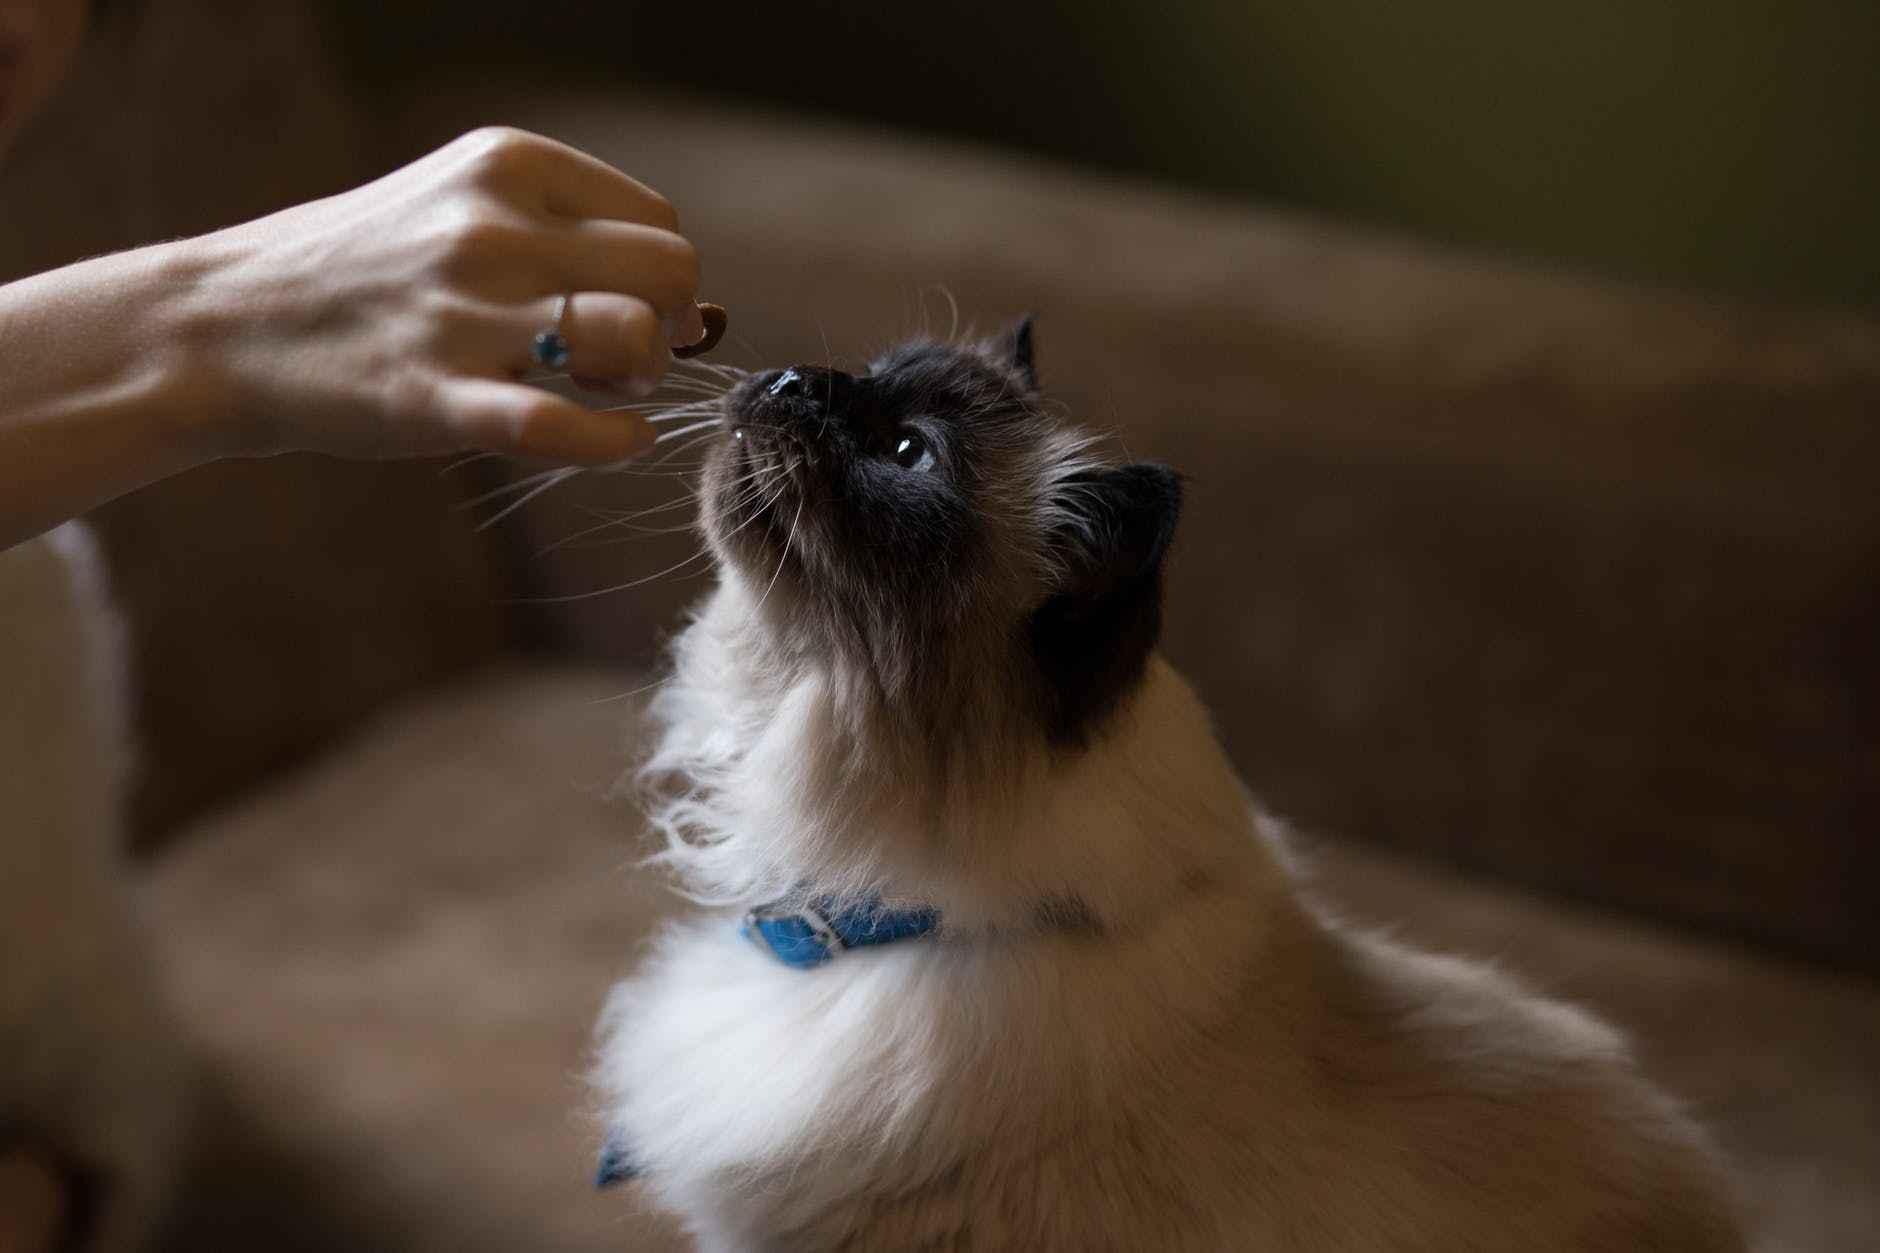 cara memanggil kucing dengan memberi hadia